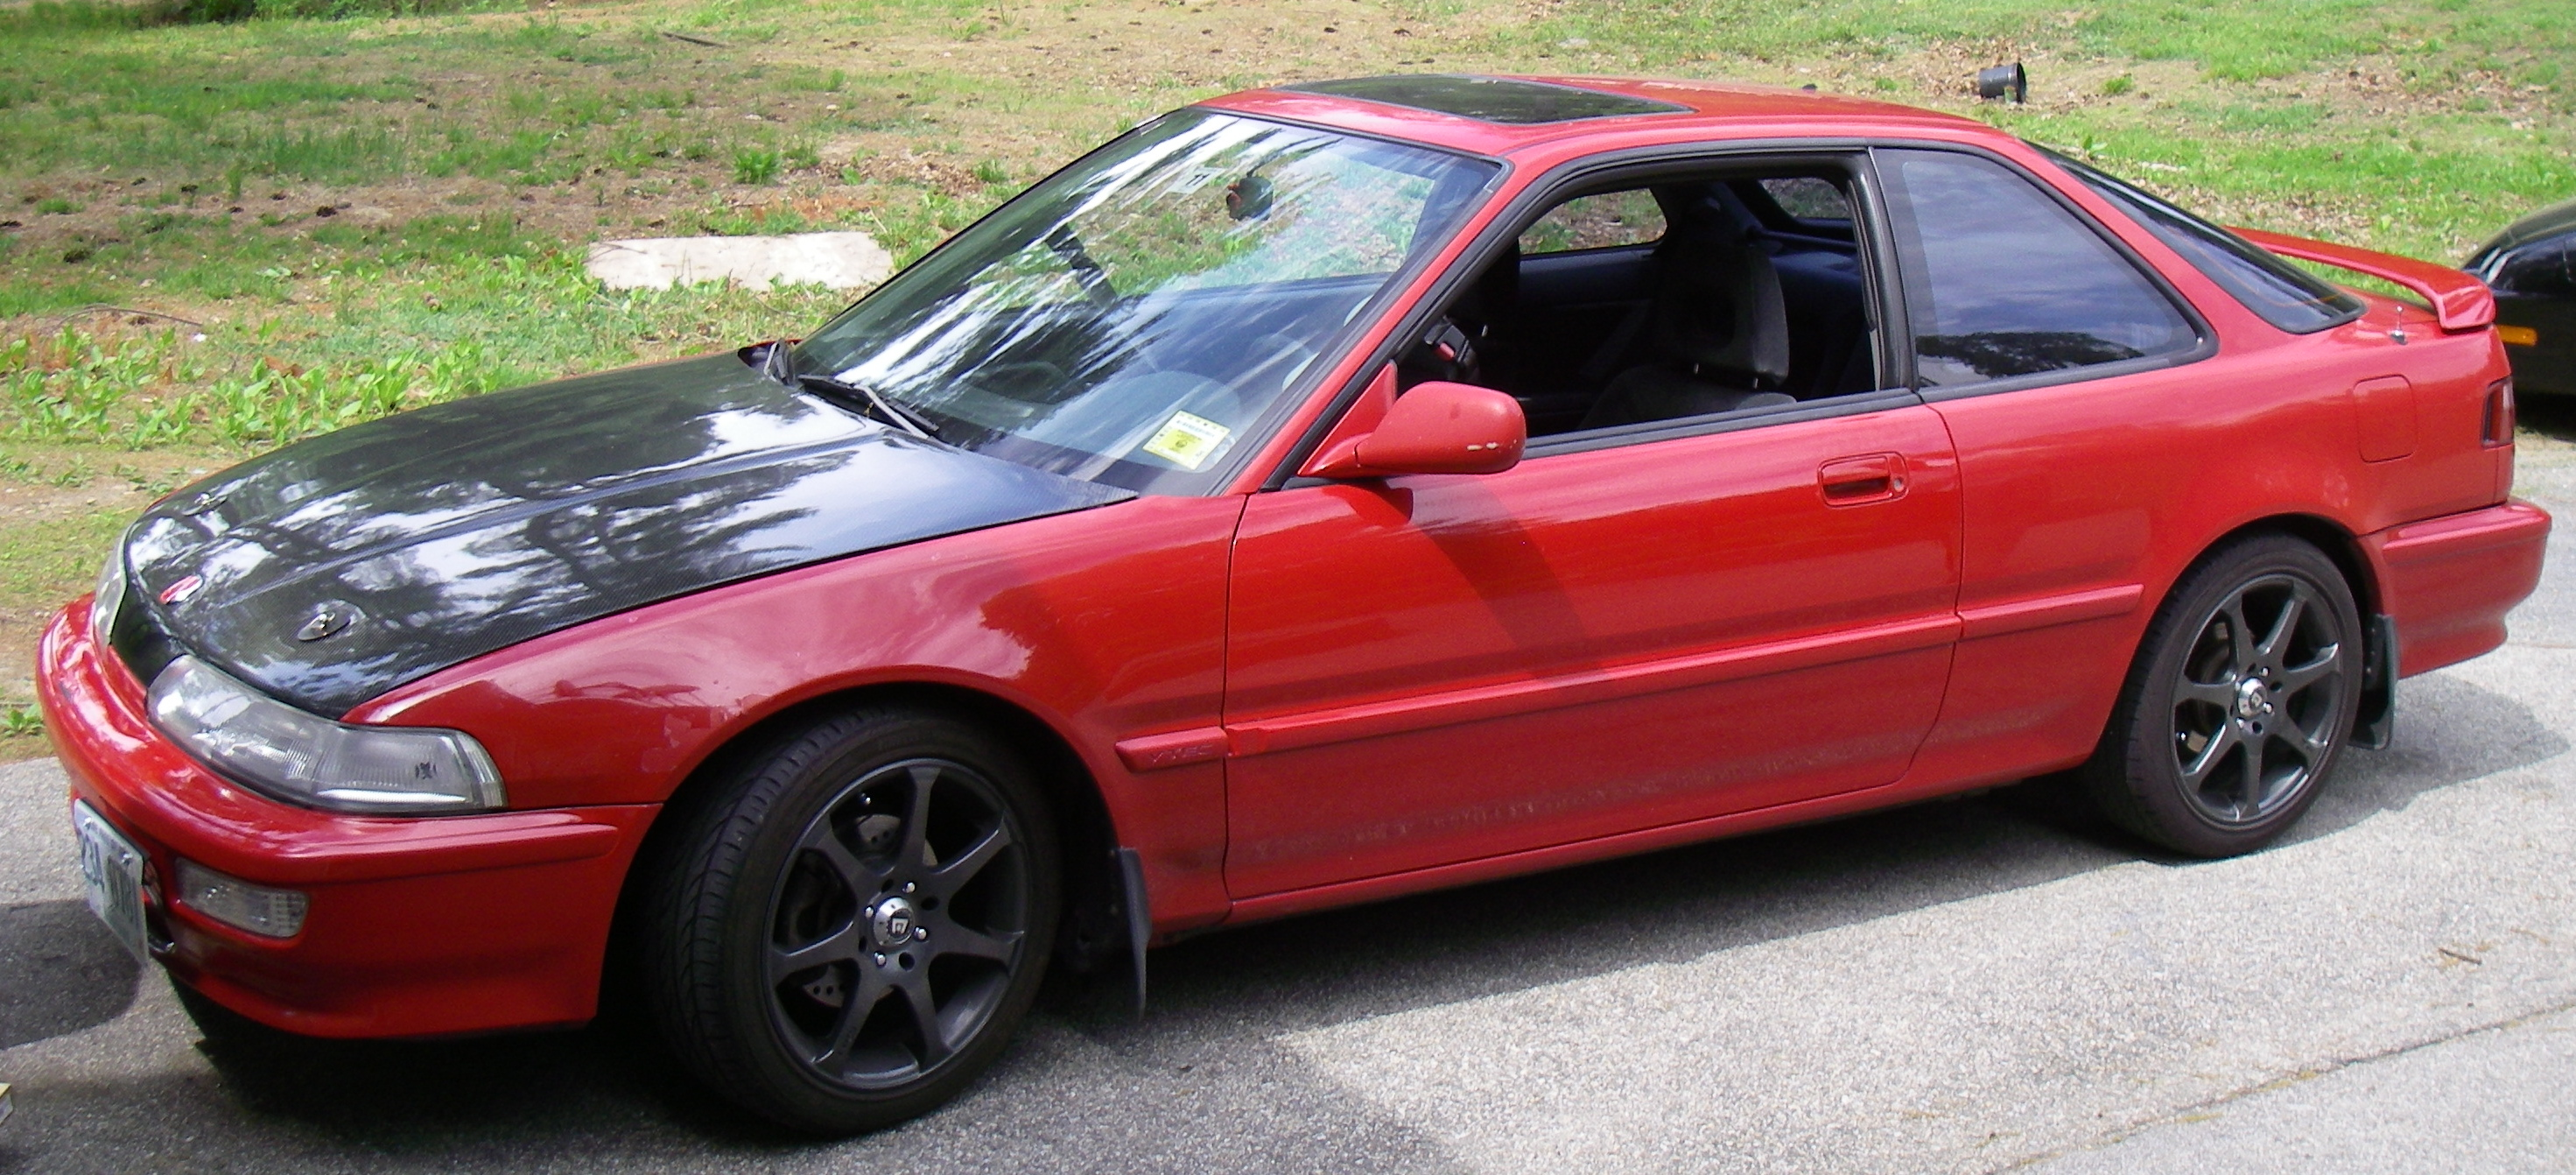 Acura Integra on 92 Acura Integra